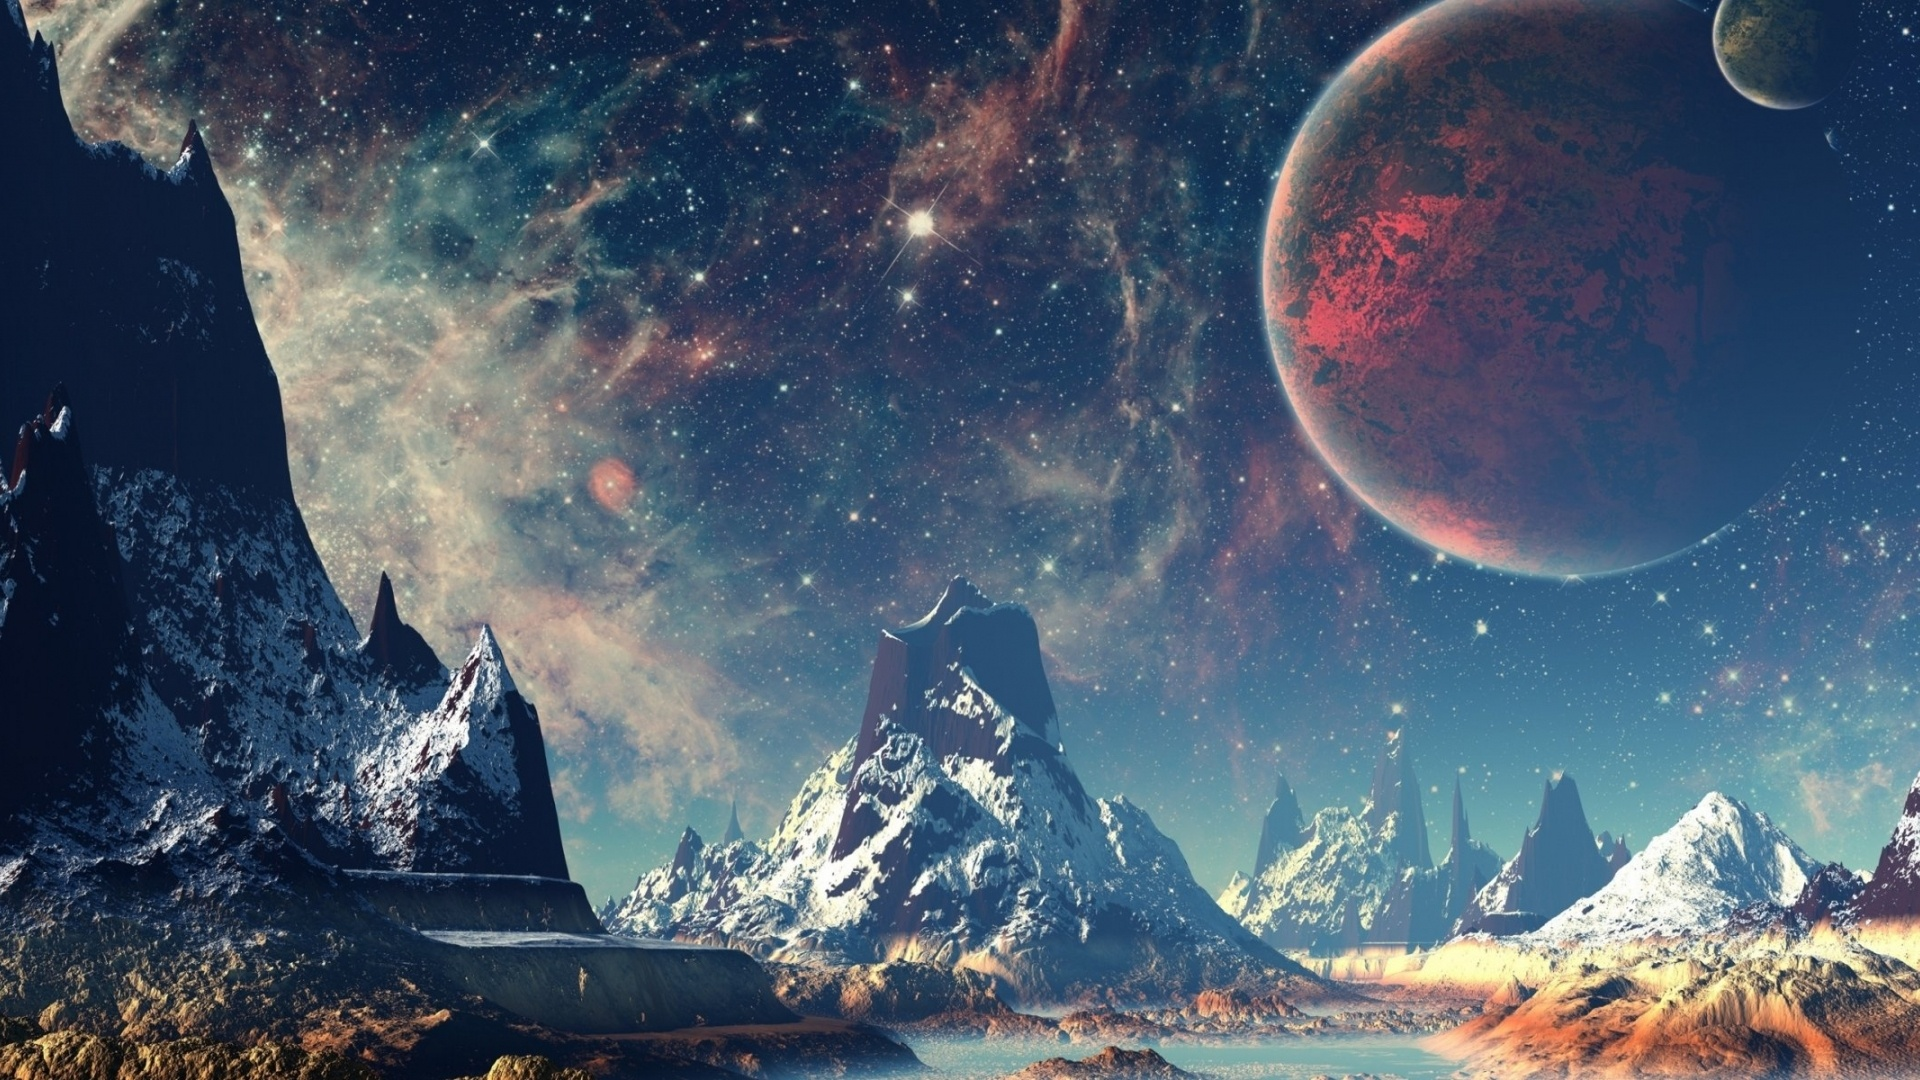 Alien Planet Art Image